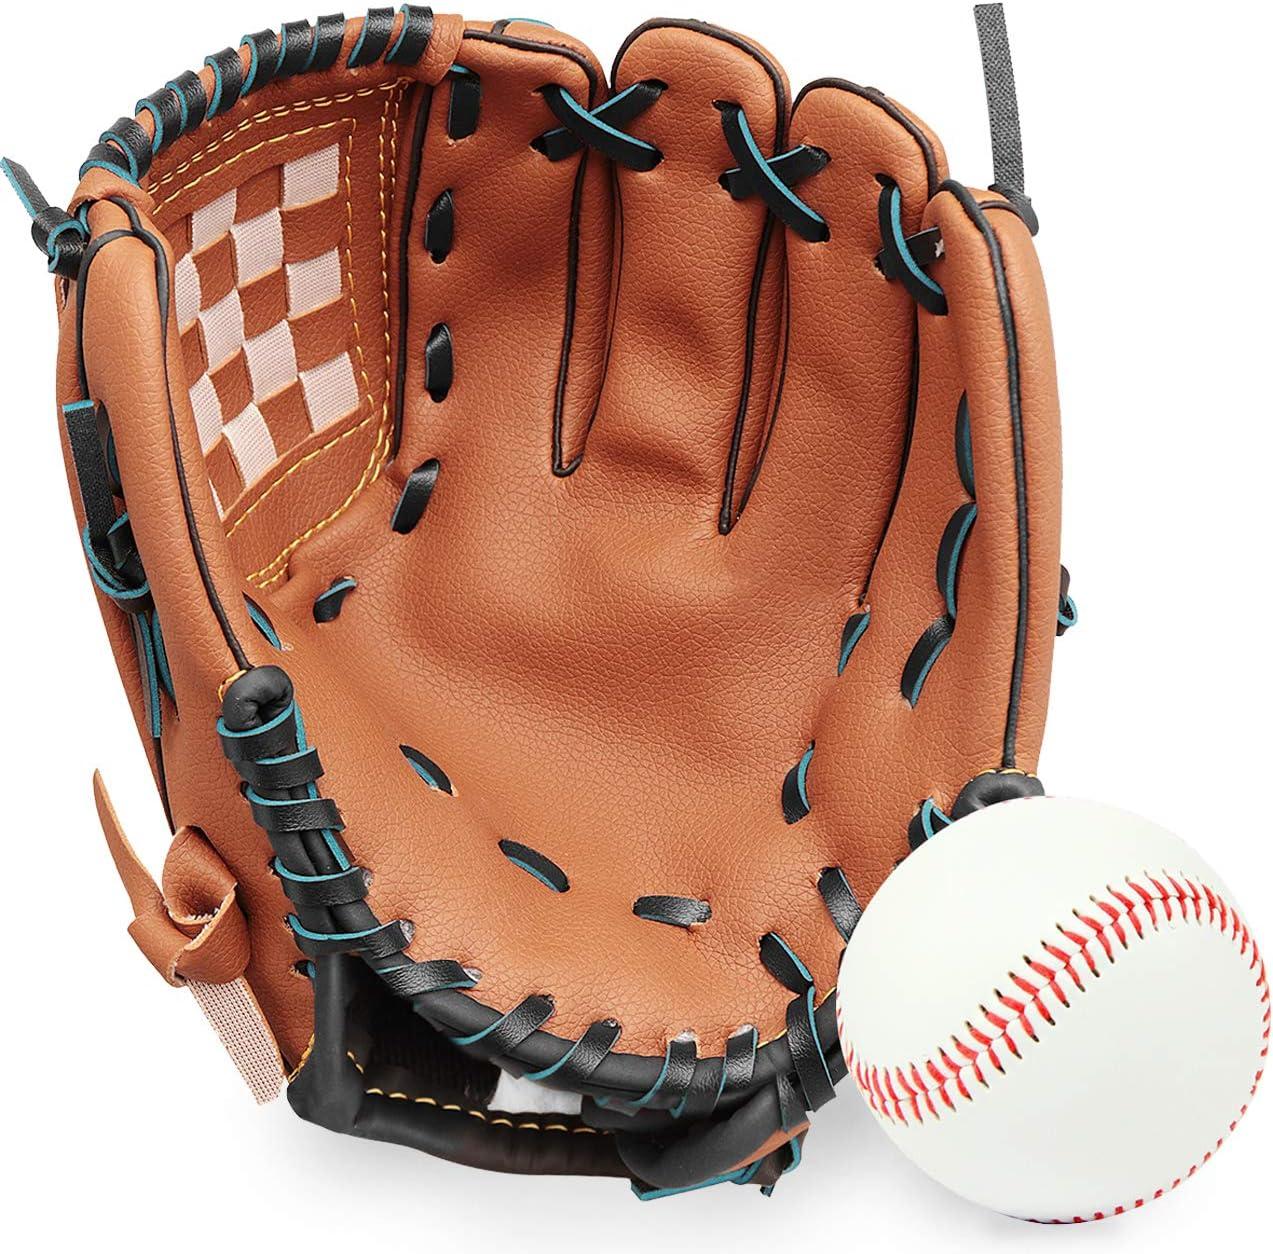 GROOFOO Baseball Glove San Francisco Mall and Ball for Softball Adults Kids Youth T Brand new